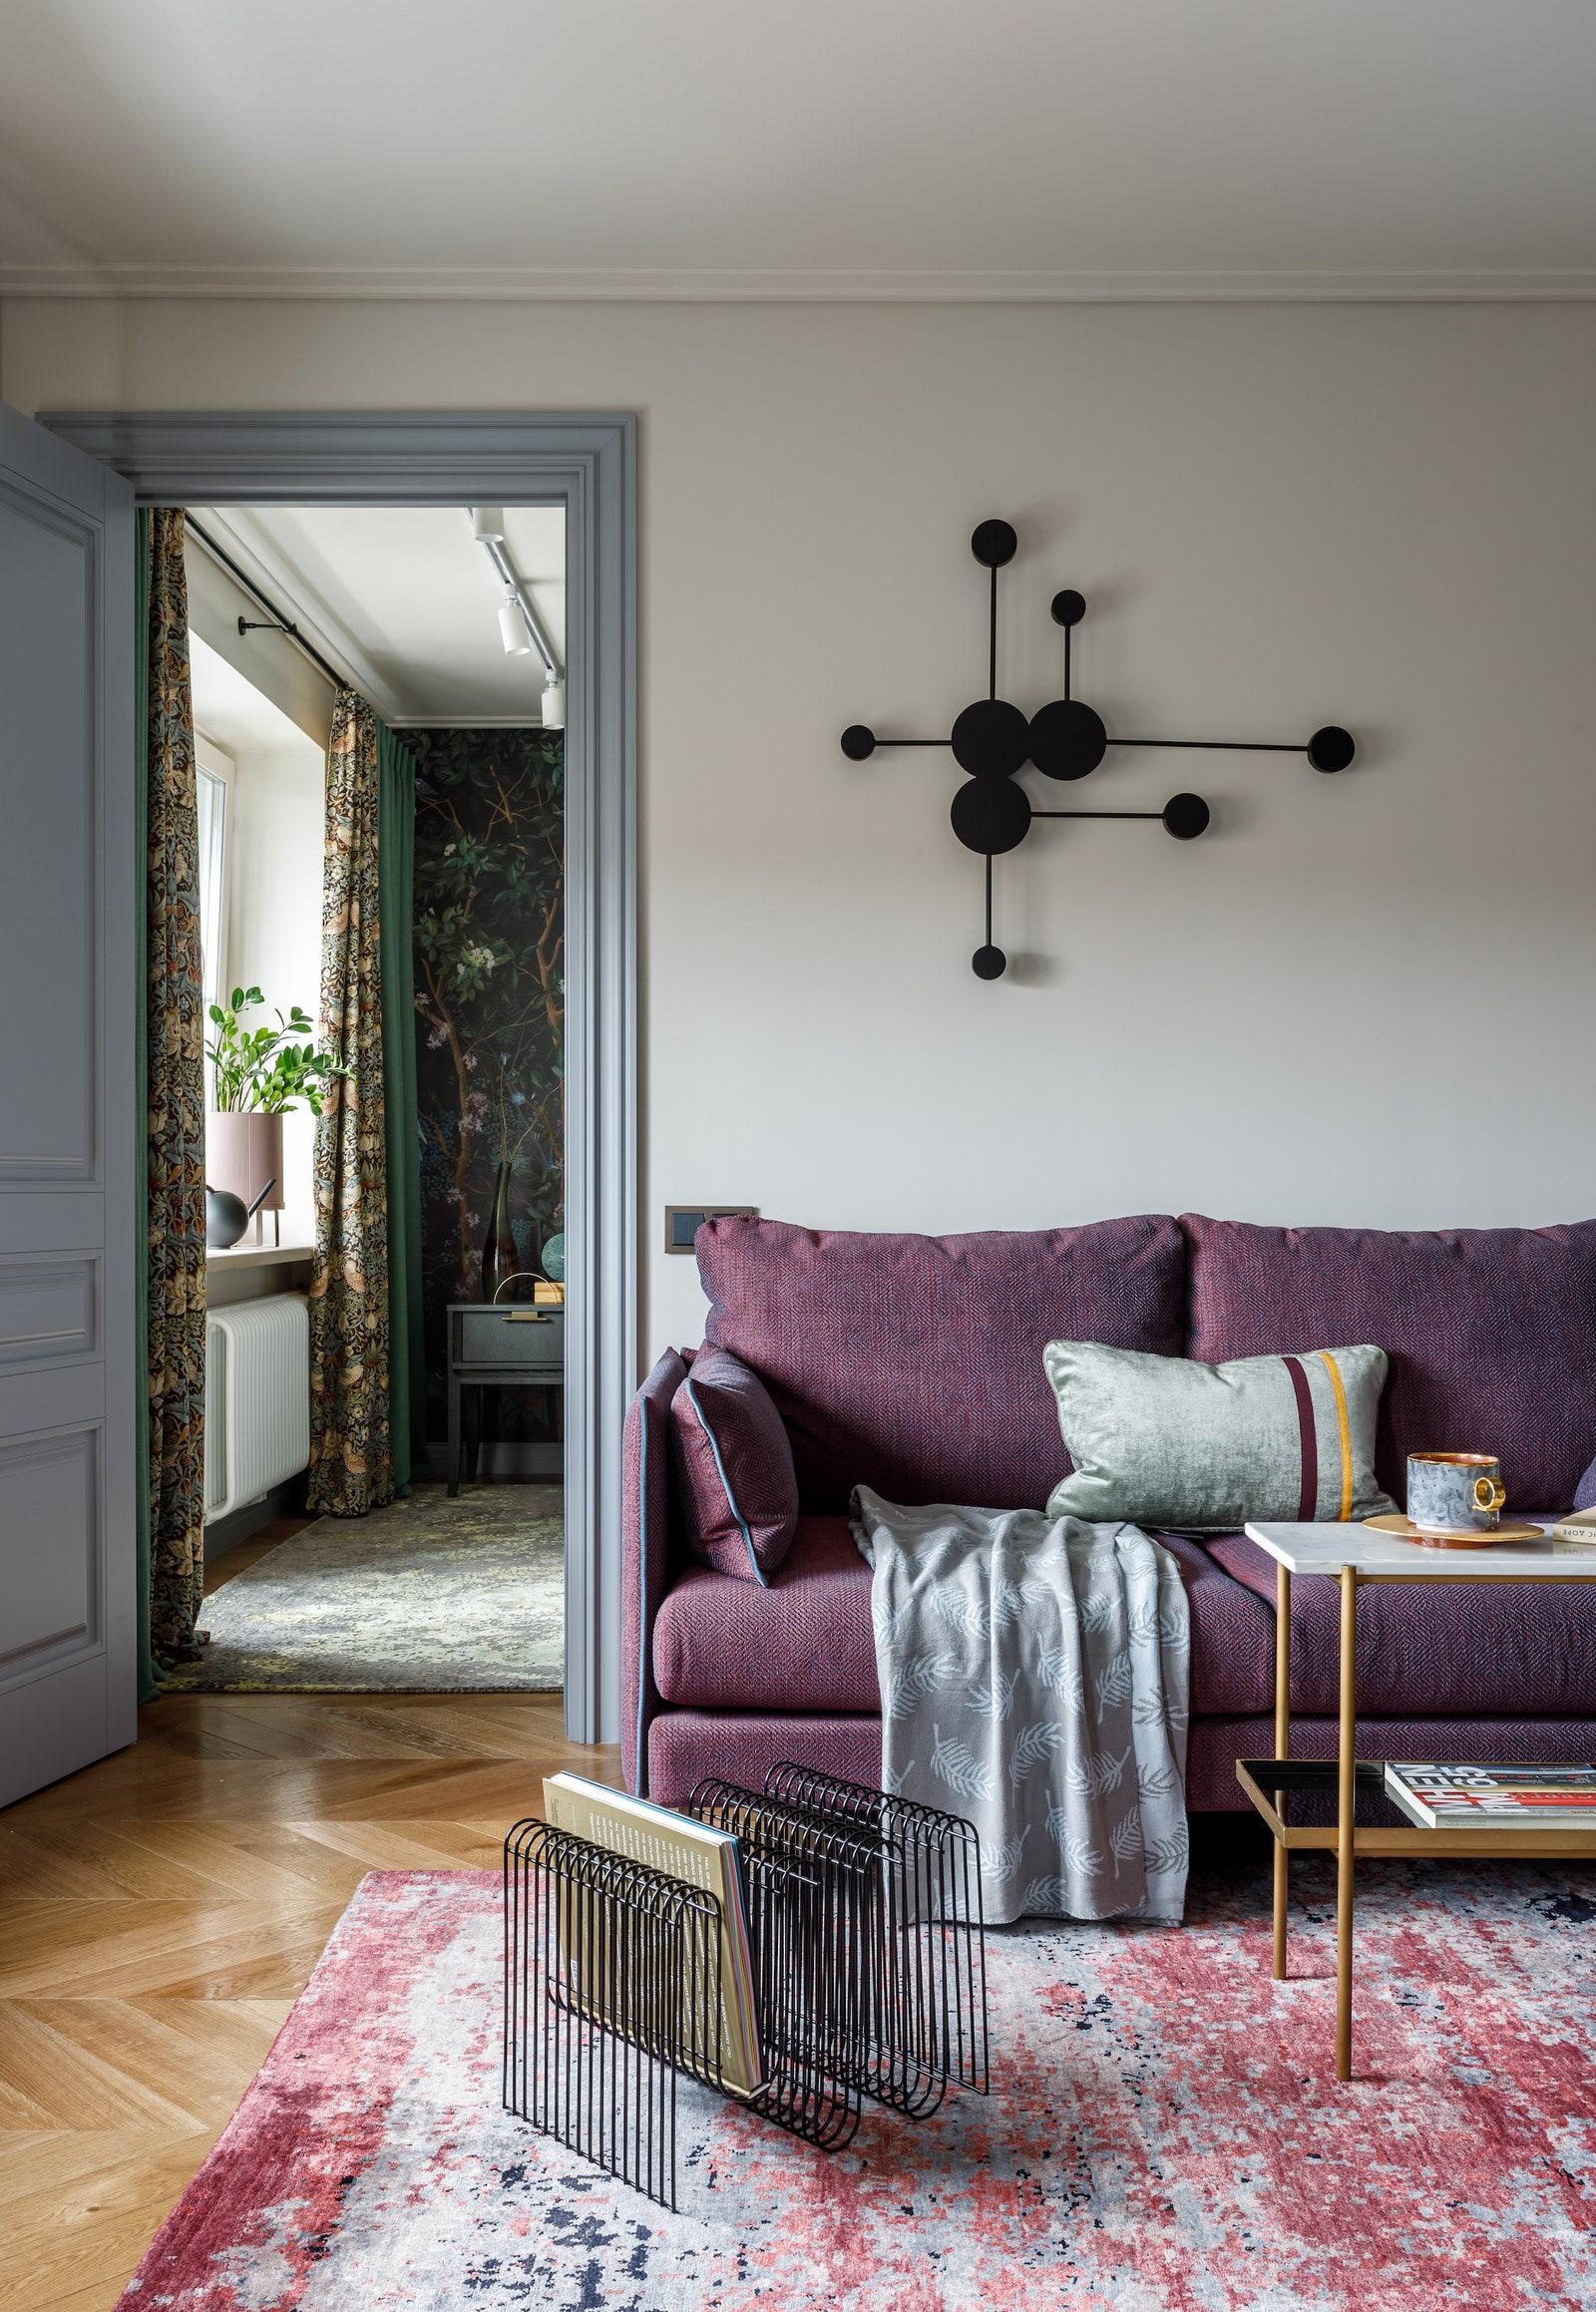 .                   .  Lappartement  Design Carpets  ADecor   Dantone Home.  FarrowampBall.